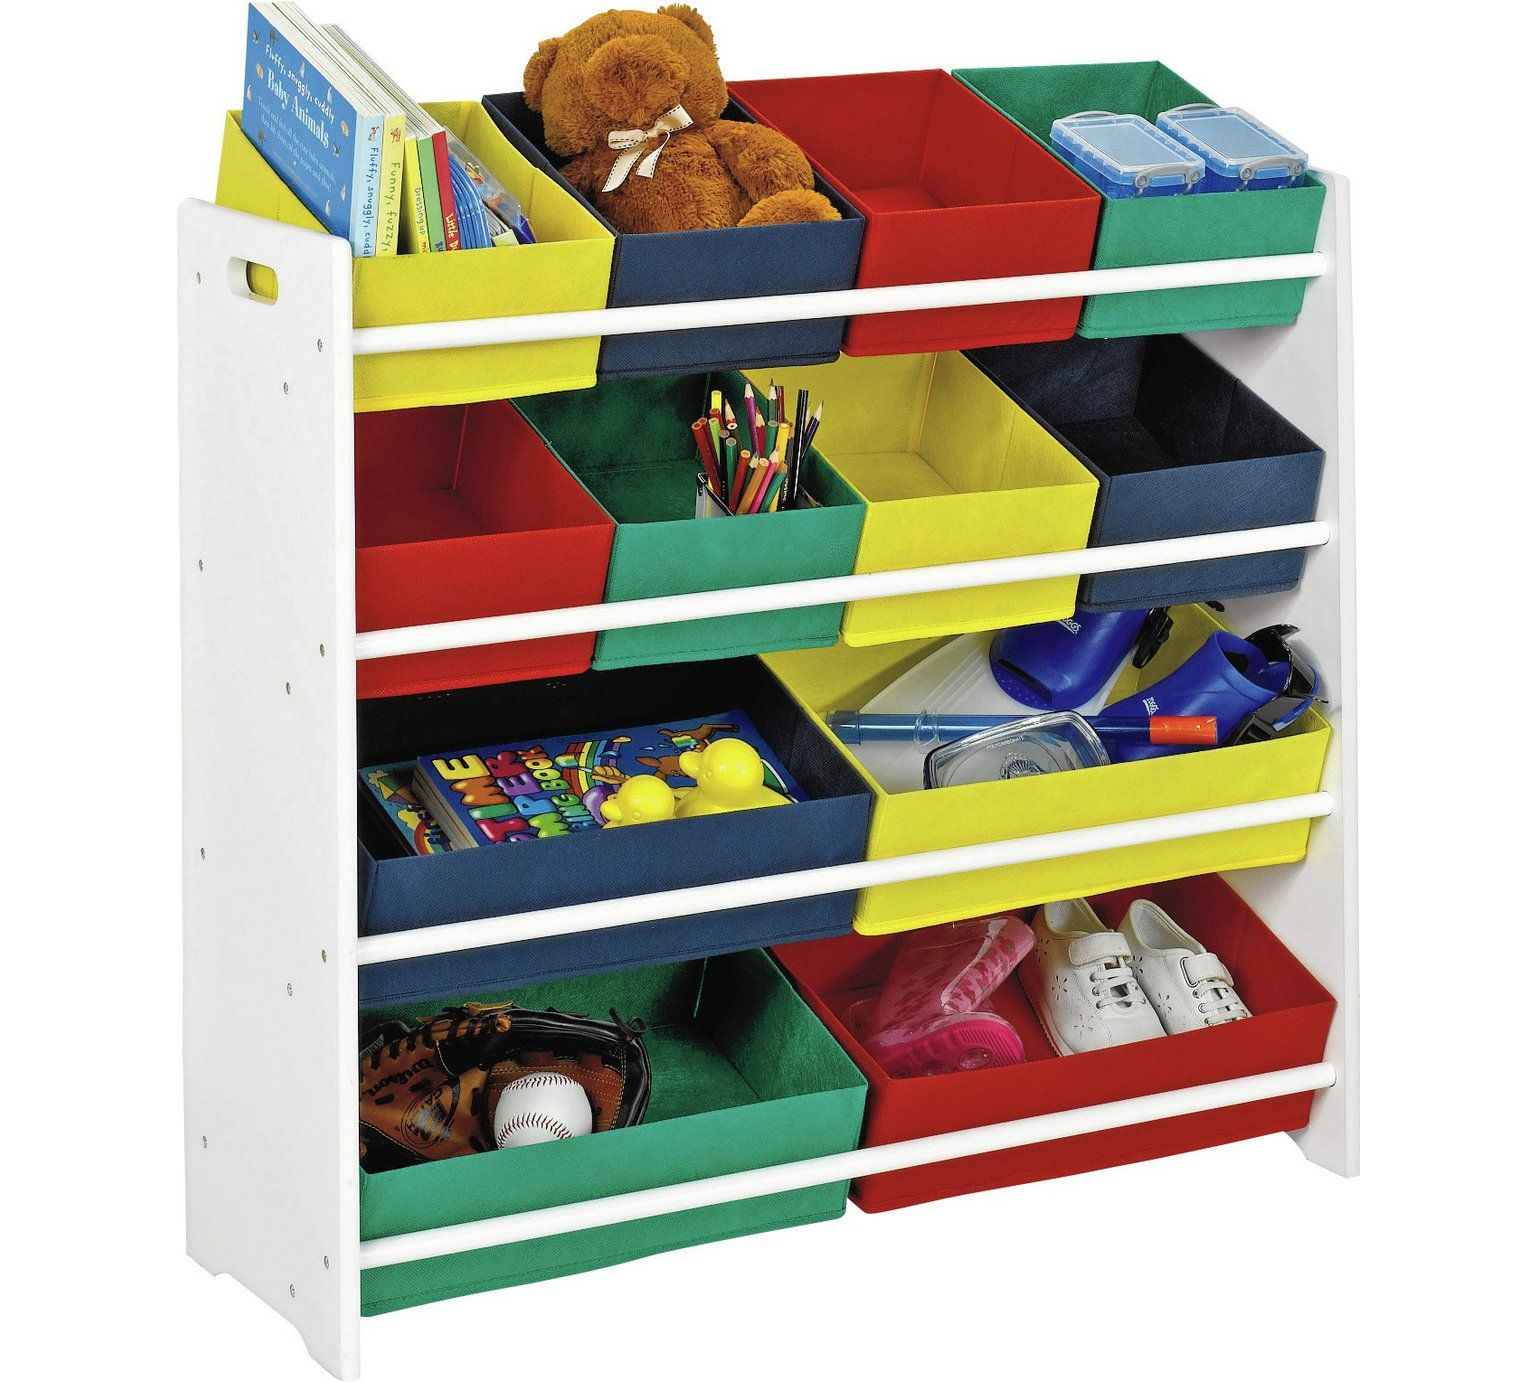 Toy Kitchen Argos Uk